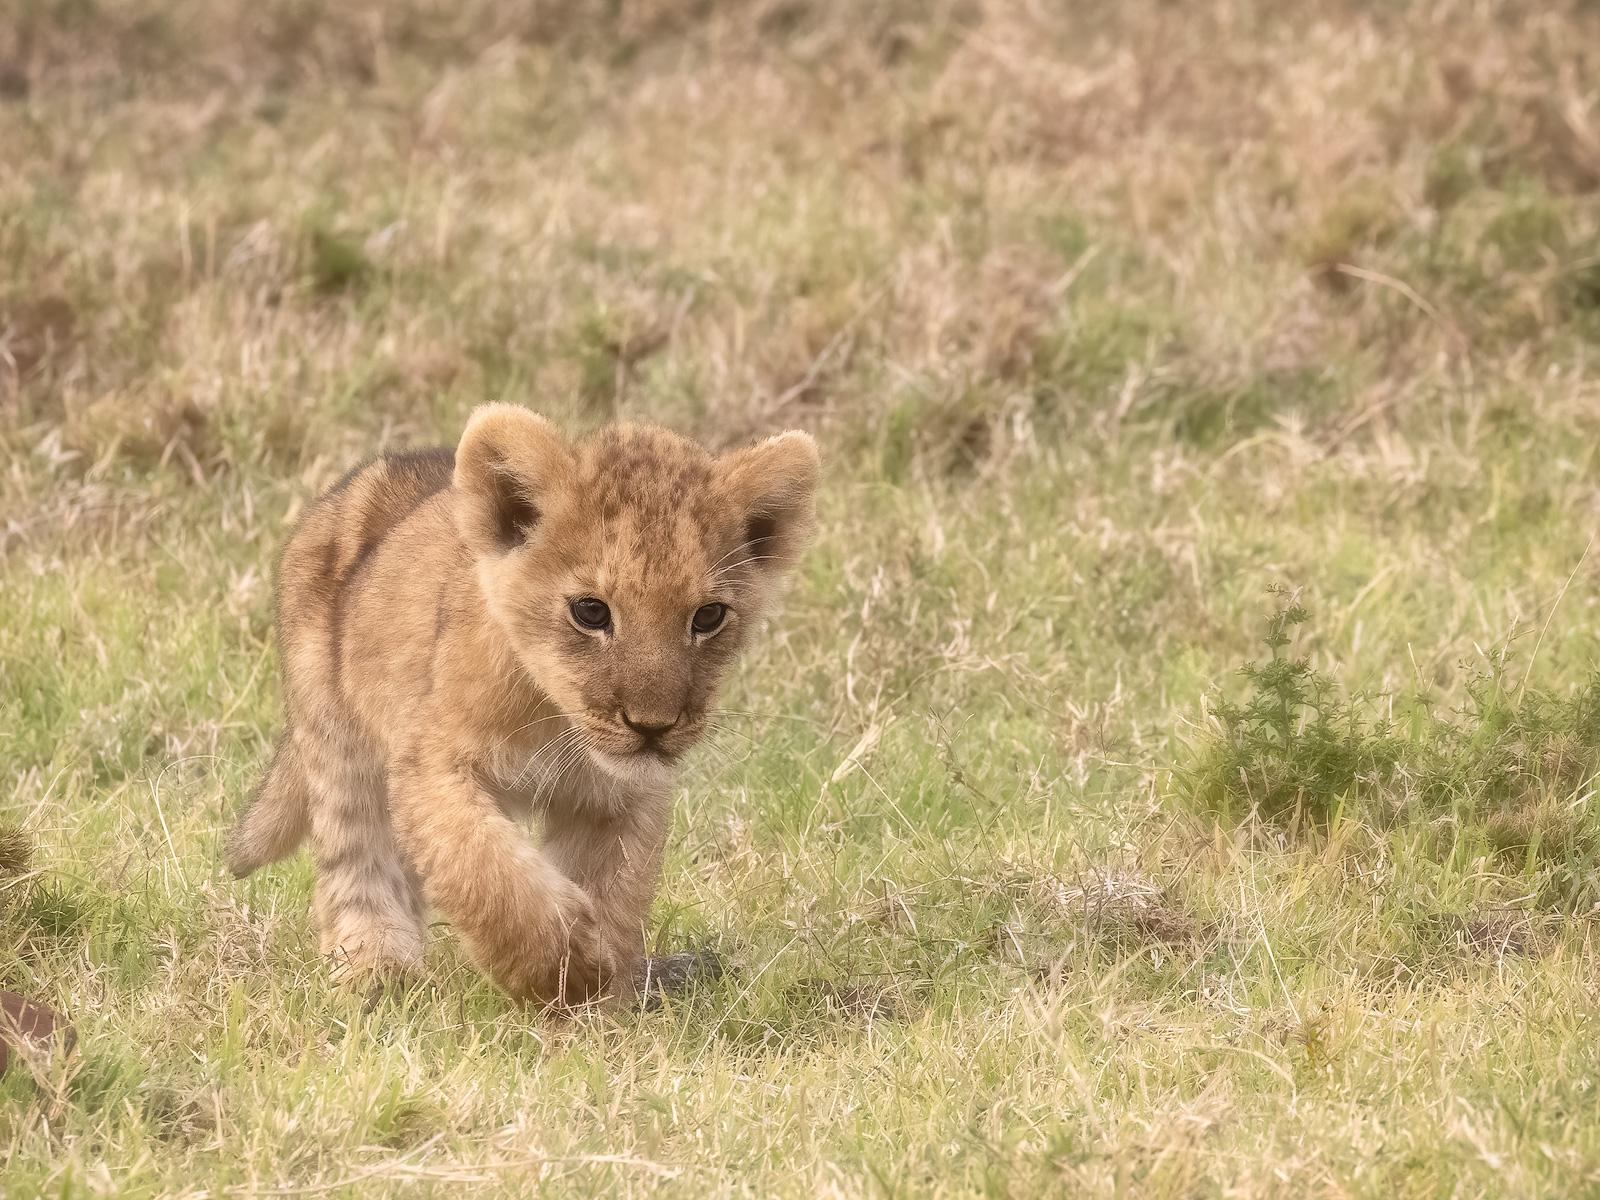 An adorable 3-week old lion cub exploring the plains of the Masai Mara.